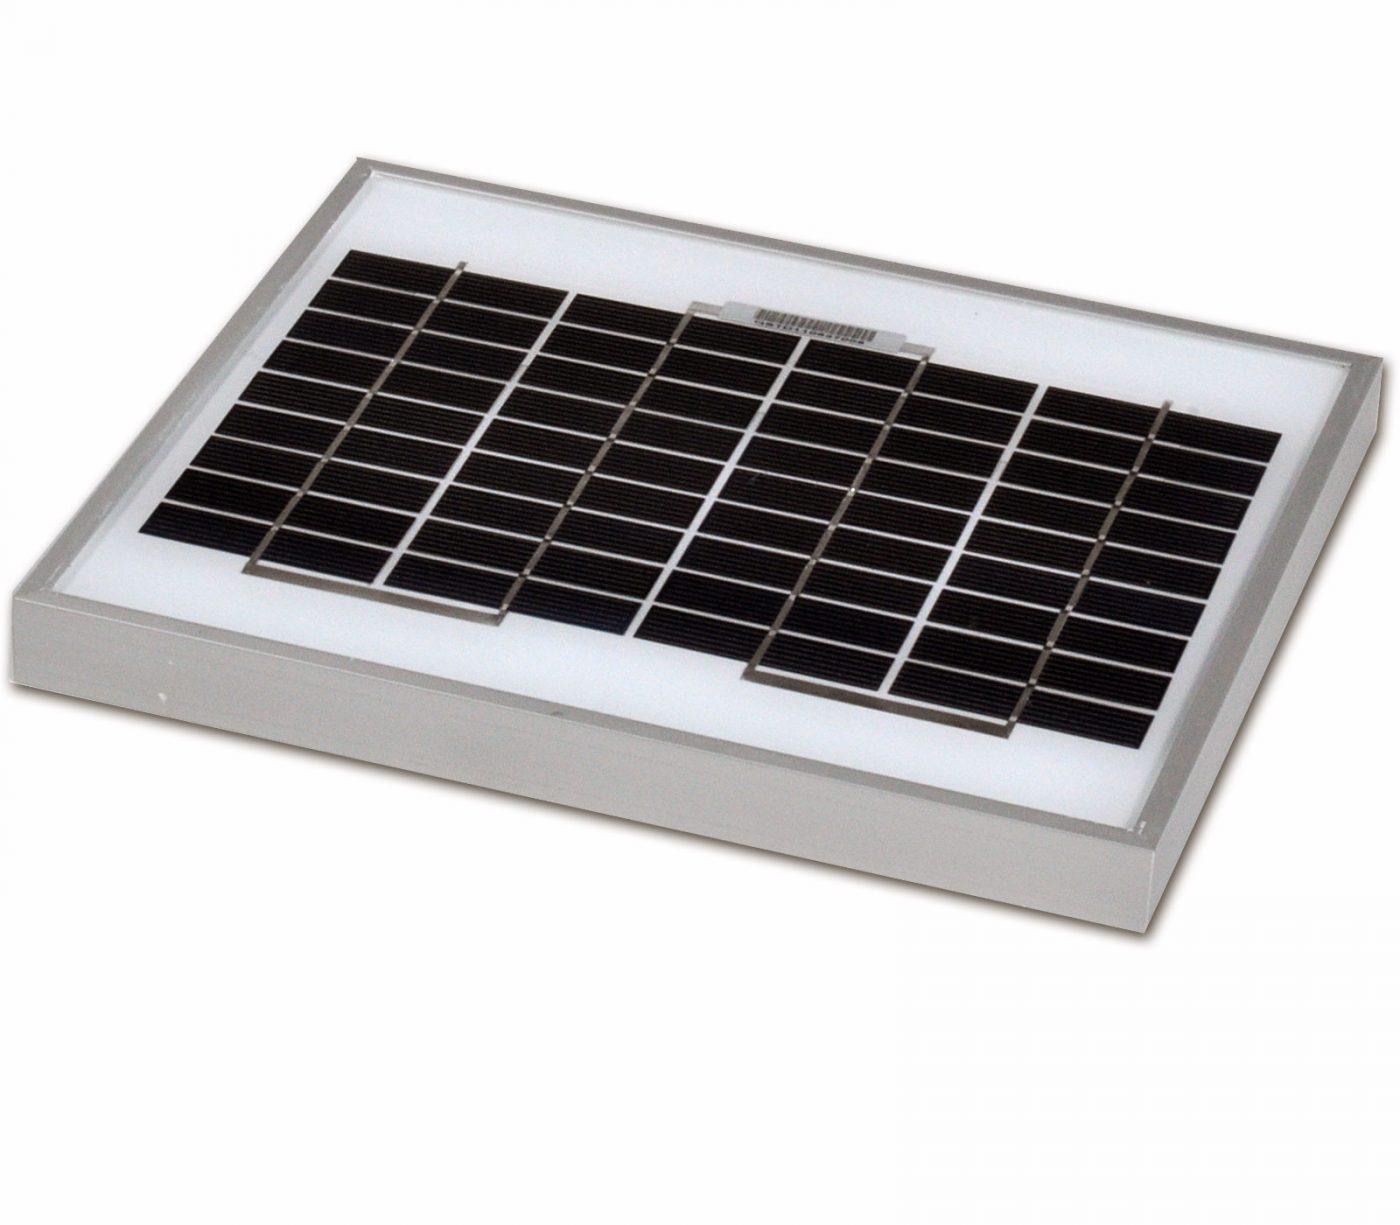 12v 5w solar panel monocrystalline 265x200 sunstore solar. Black Bedroom Furniture Sets. Home Design Ideas